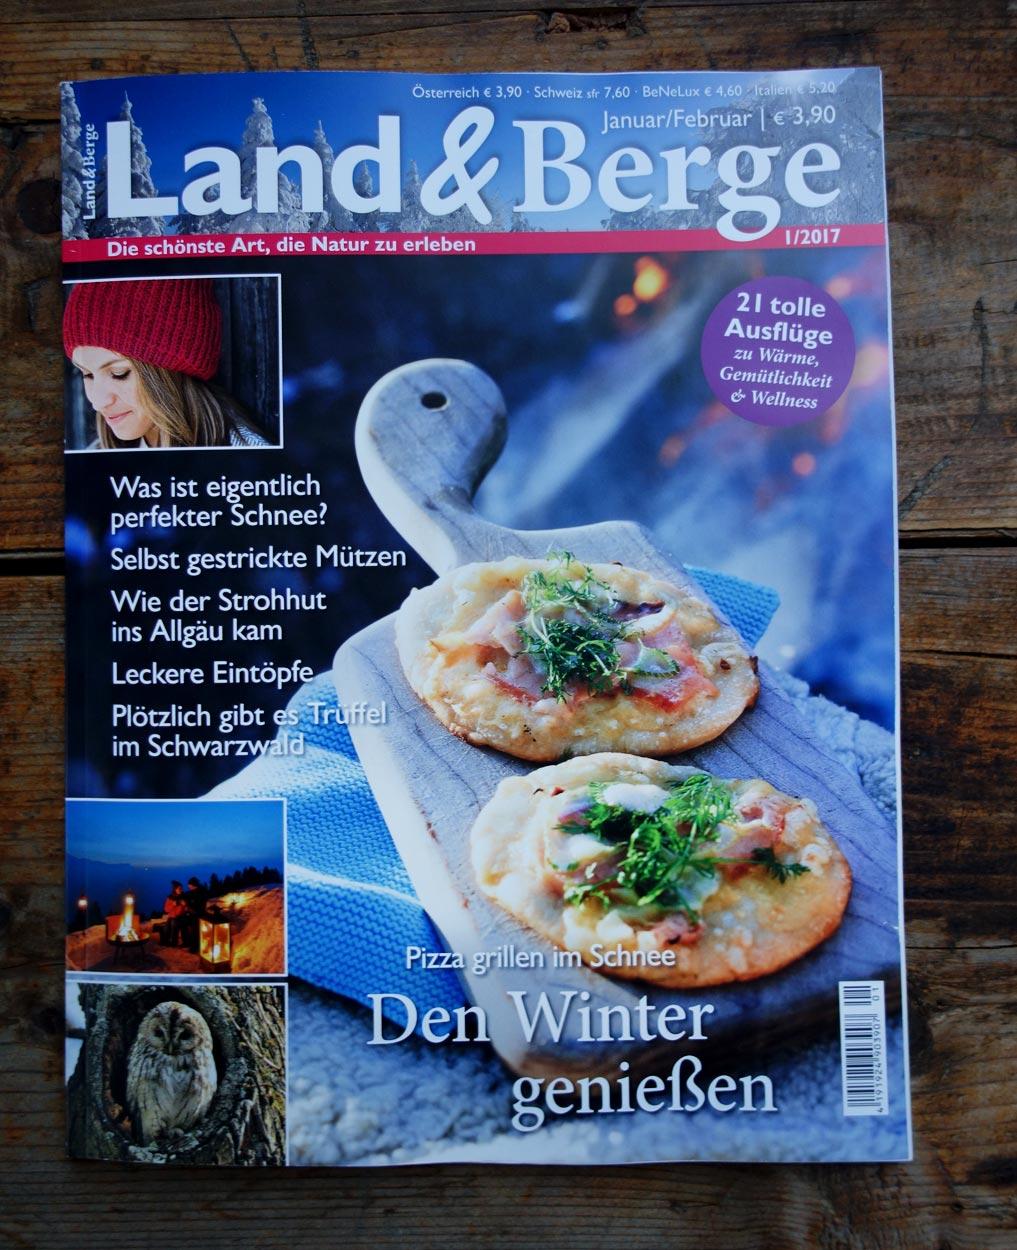 Wohlgeraten in Land und Berge 1 2017 Cover